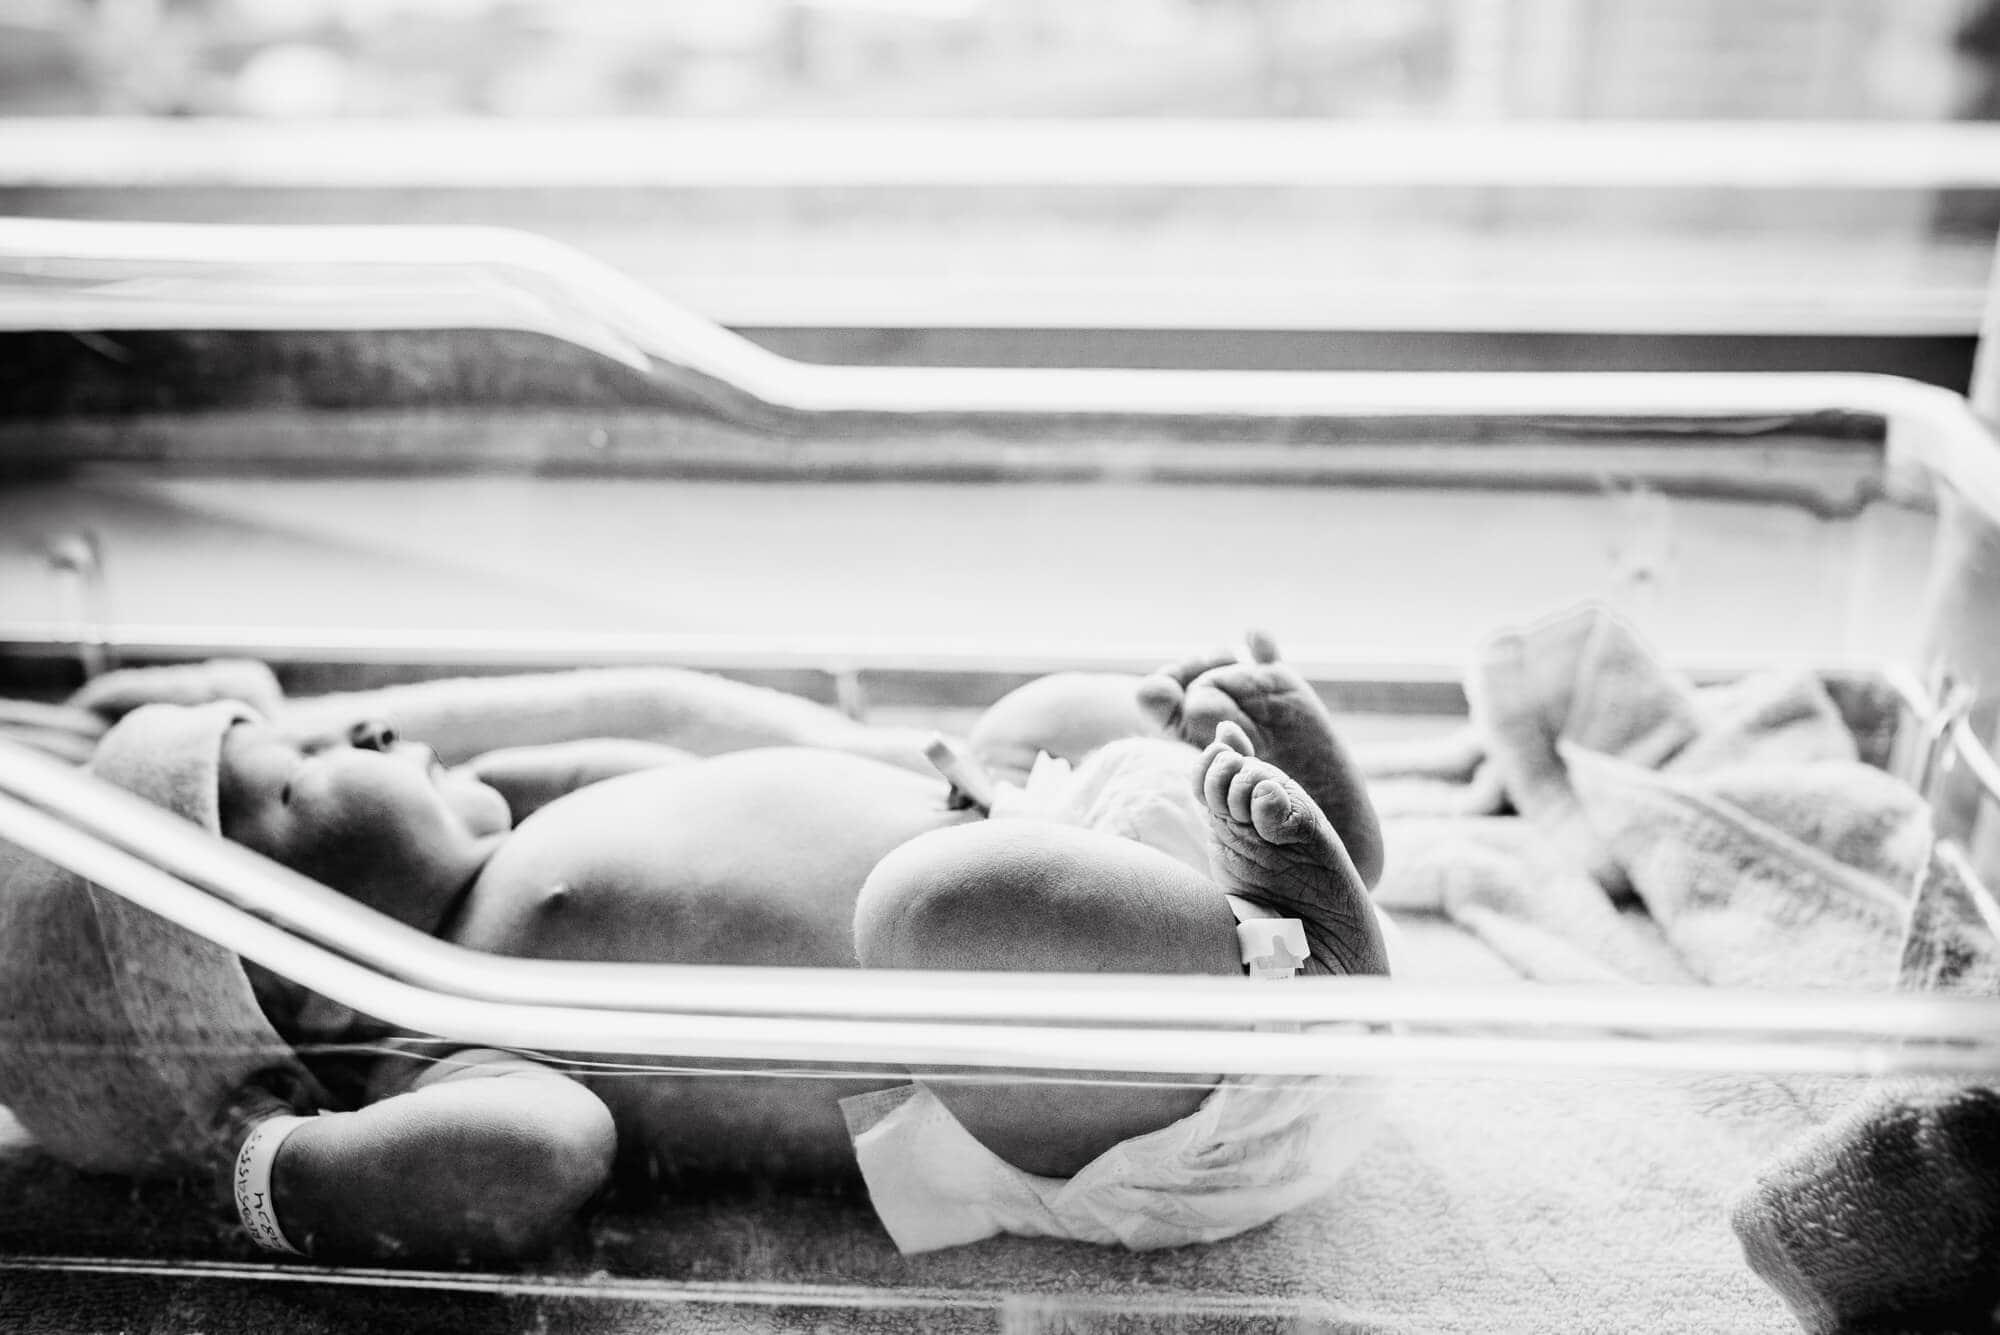 newborn baby lying in bassinet